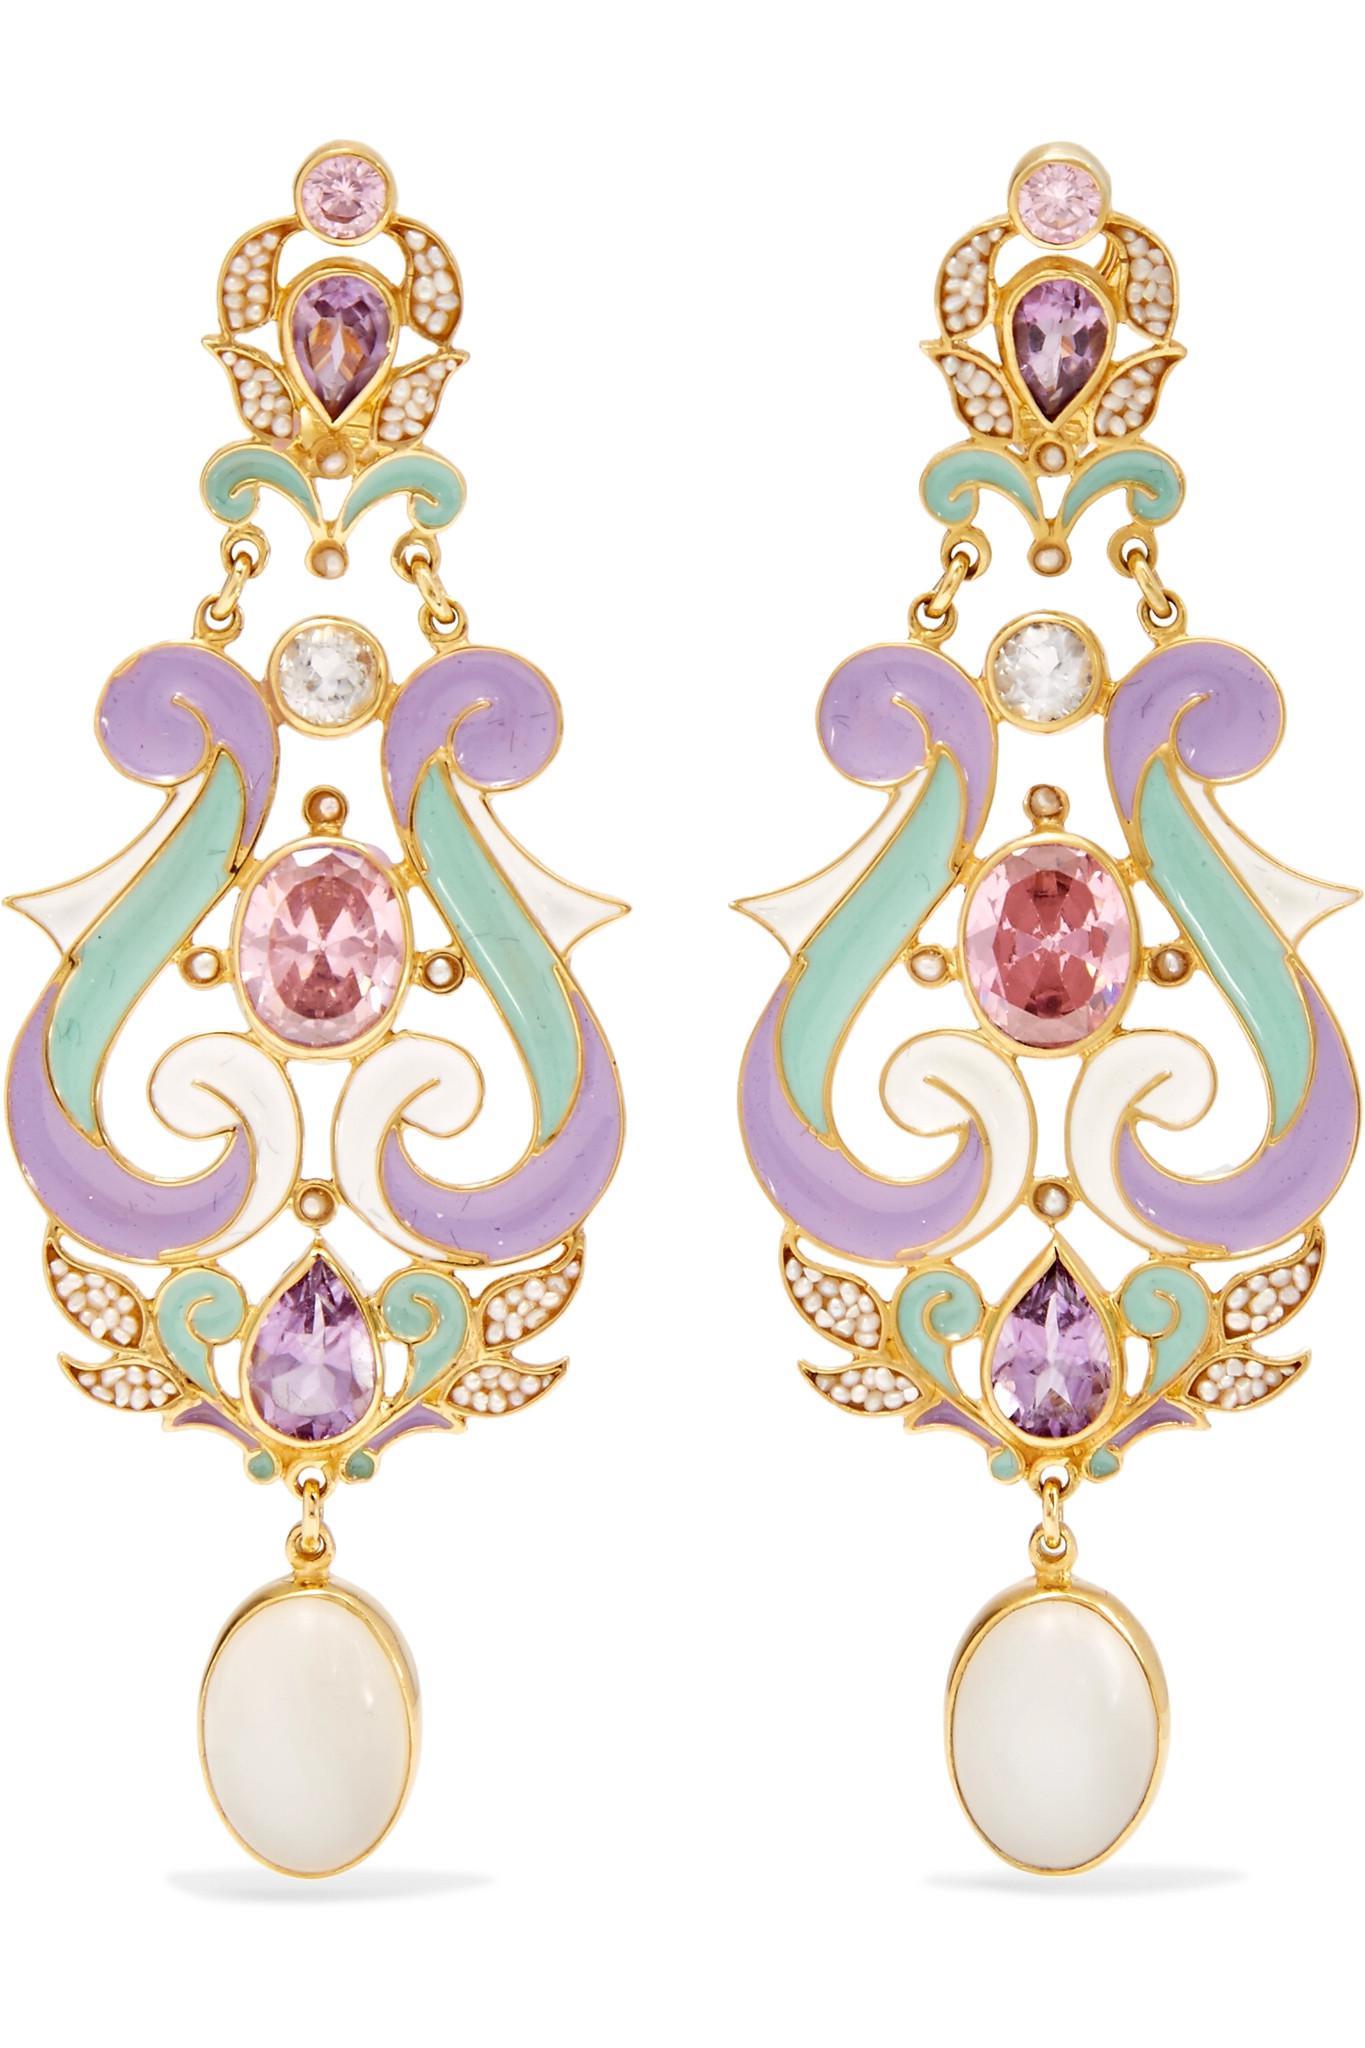 Percossi Papi Gold-plated And Enamel Multi-stone Earrings - Blue mawtLsRj